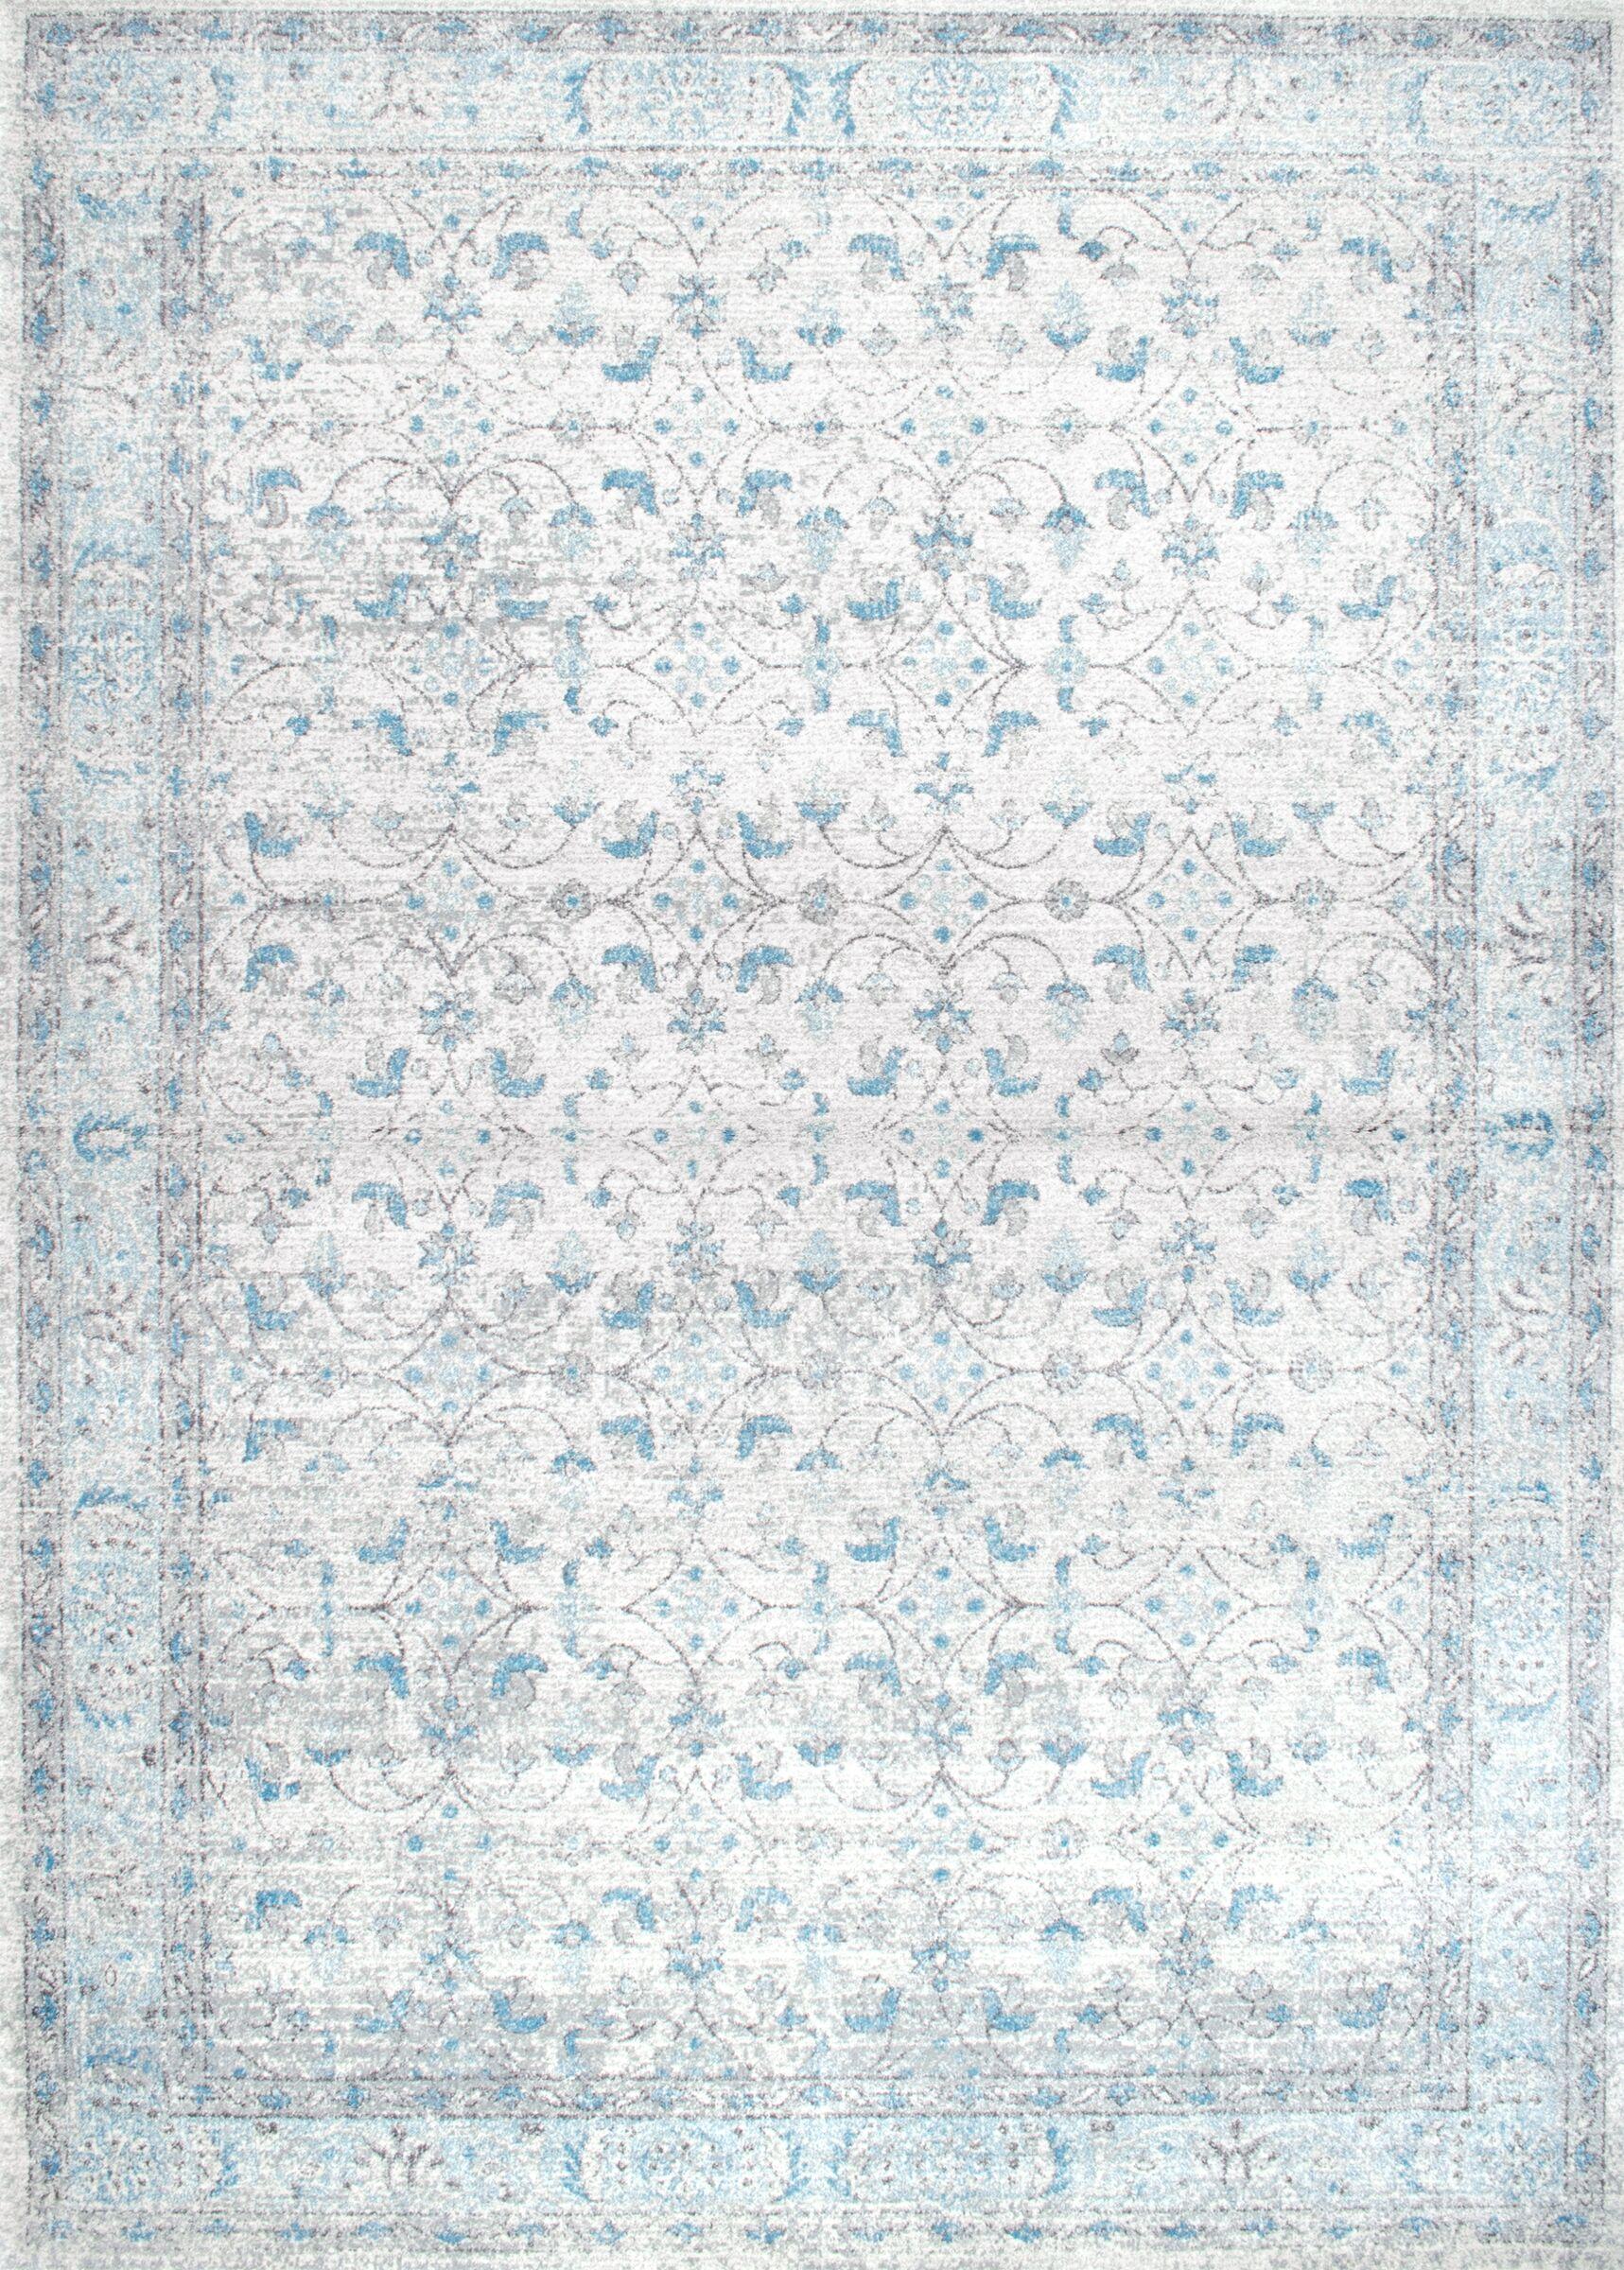 Navarrete Ivory & Cream/Blue Area Rug Rug Size: Rectangle 5' x 7'5